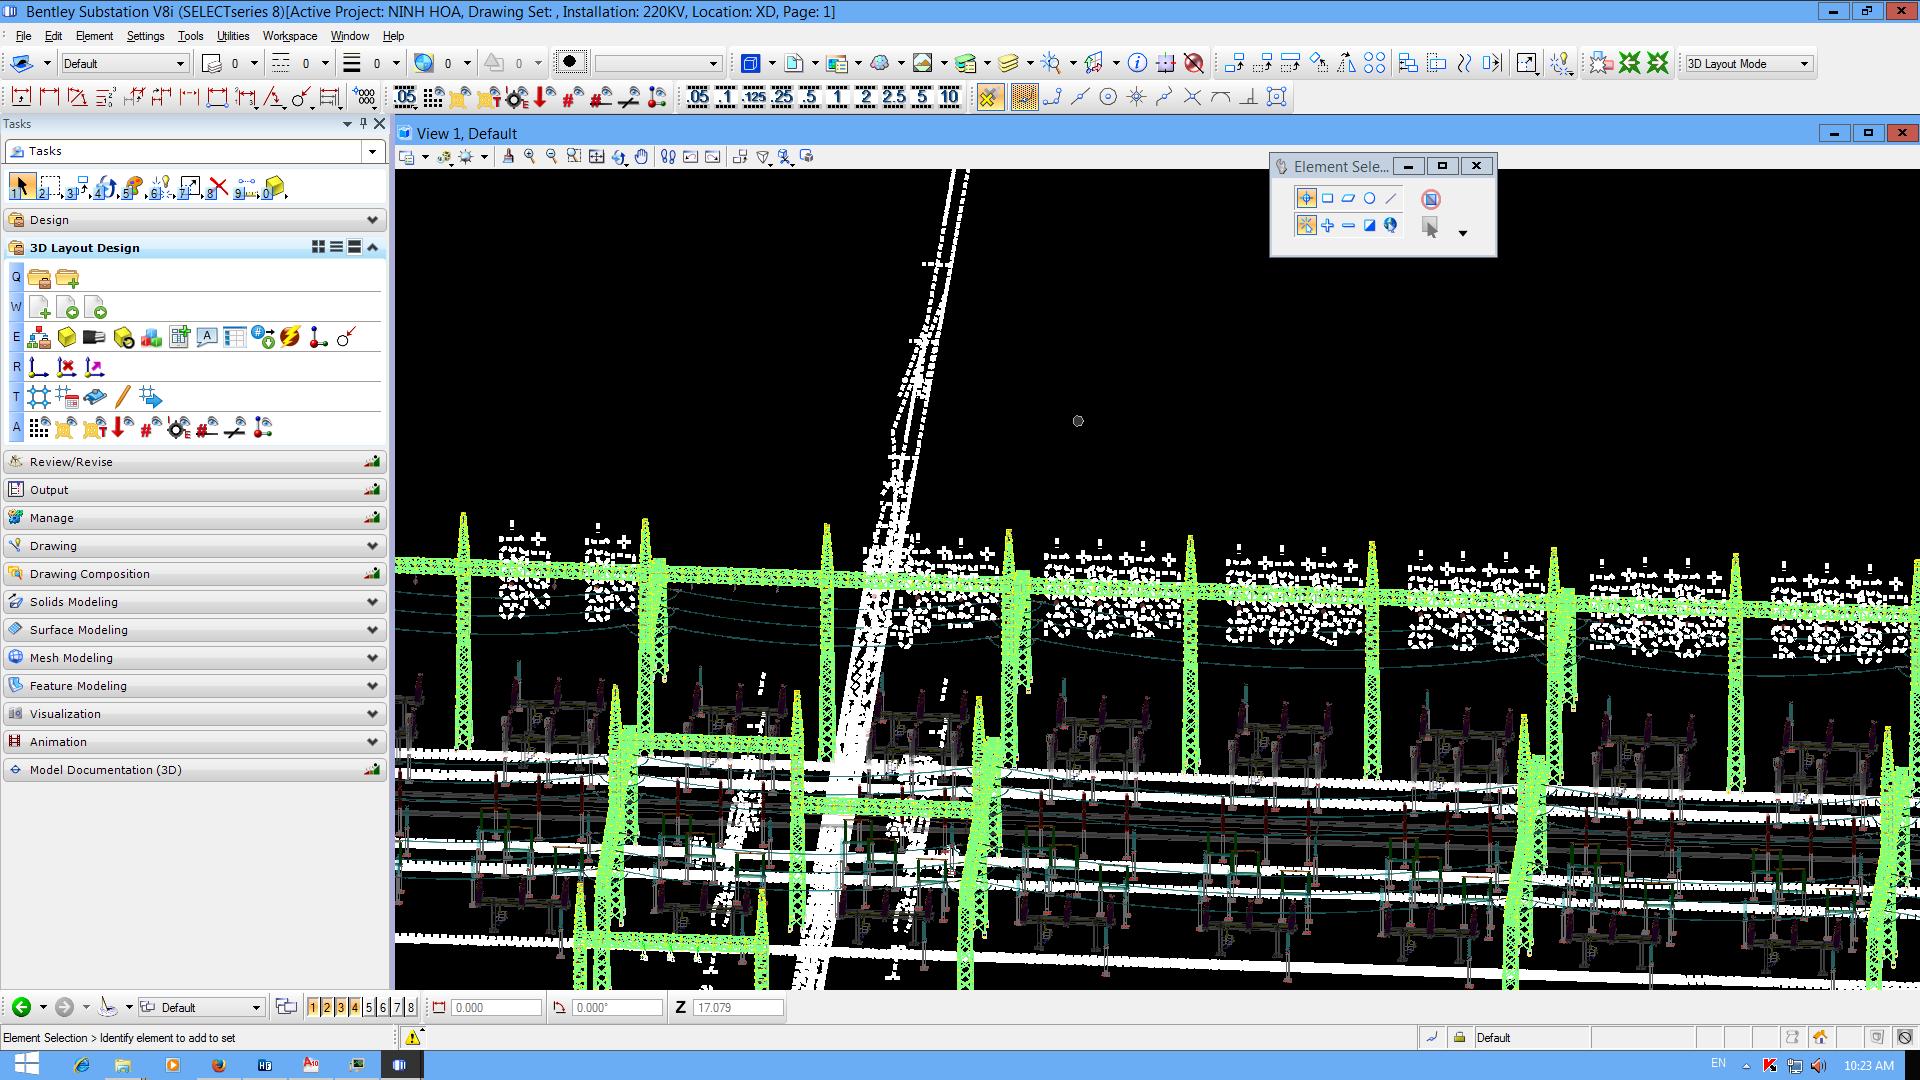 Working with Bentley Substation V8i SS8 v08.11.13.140 full license